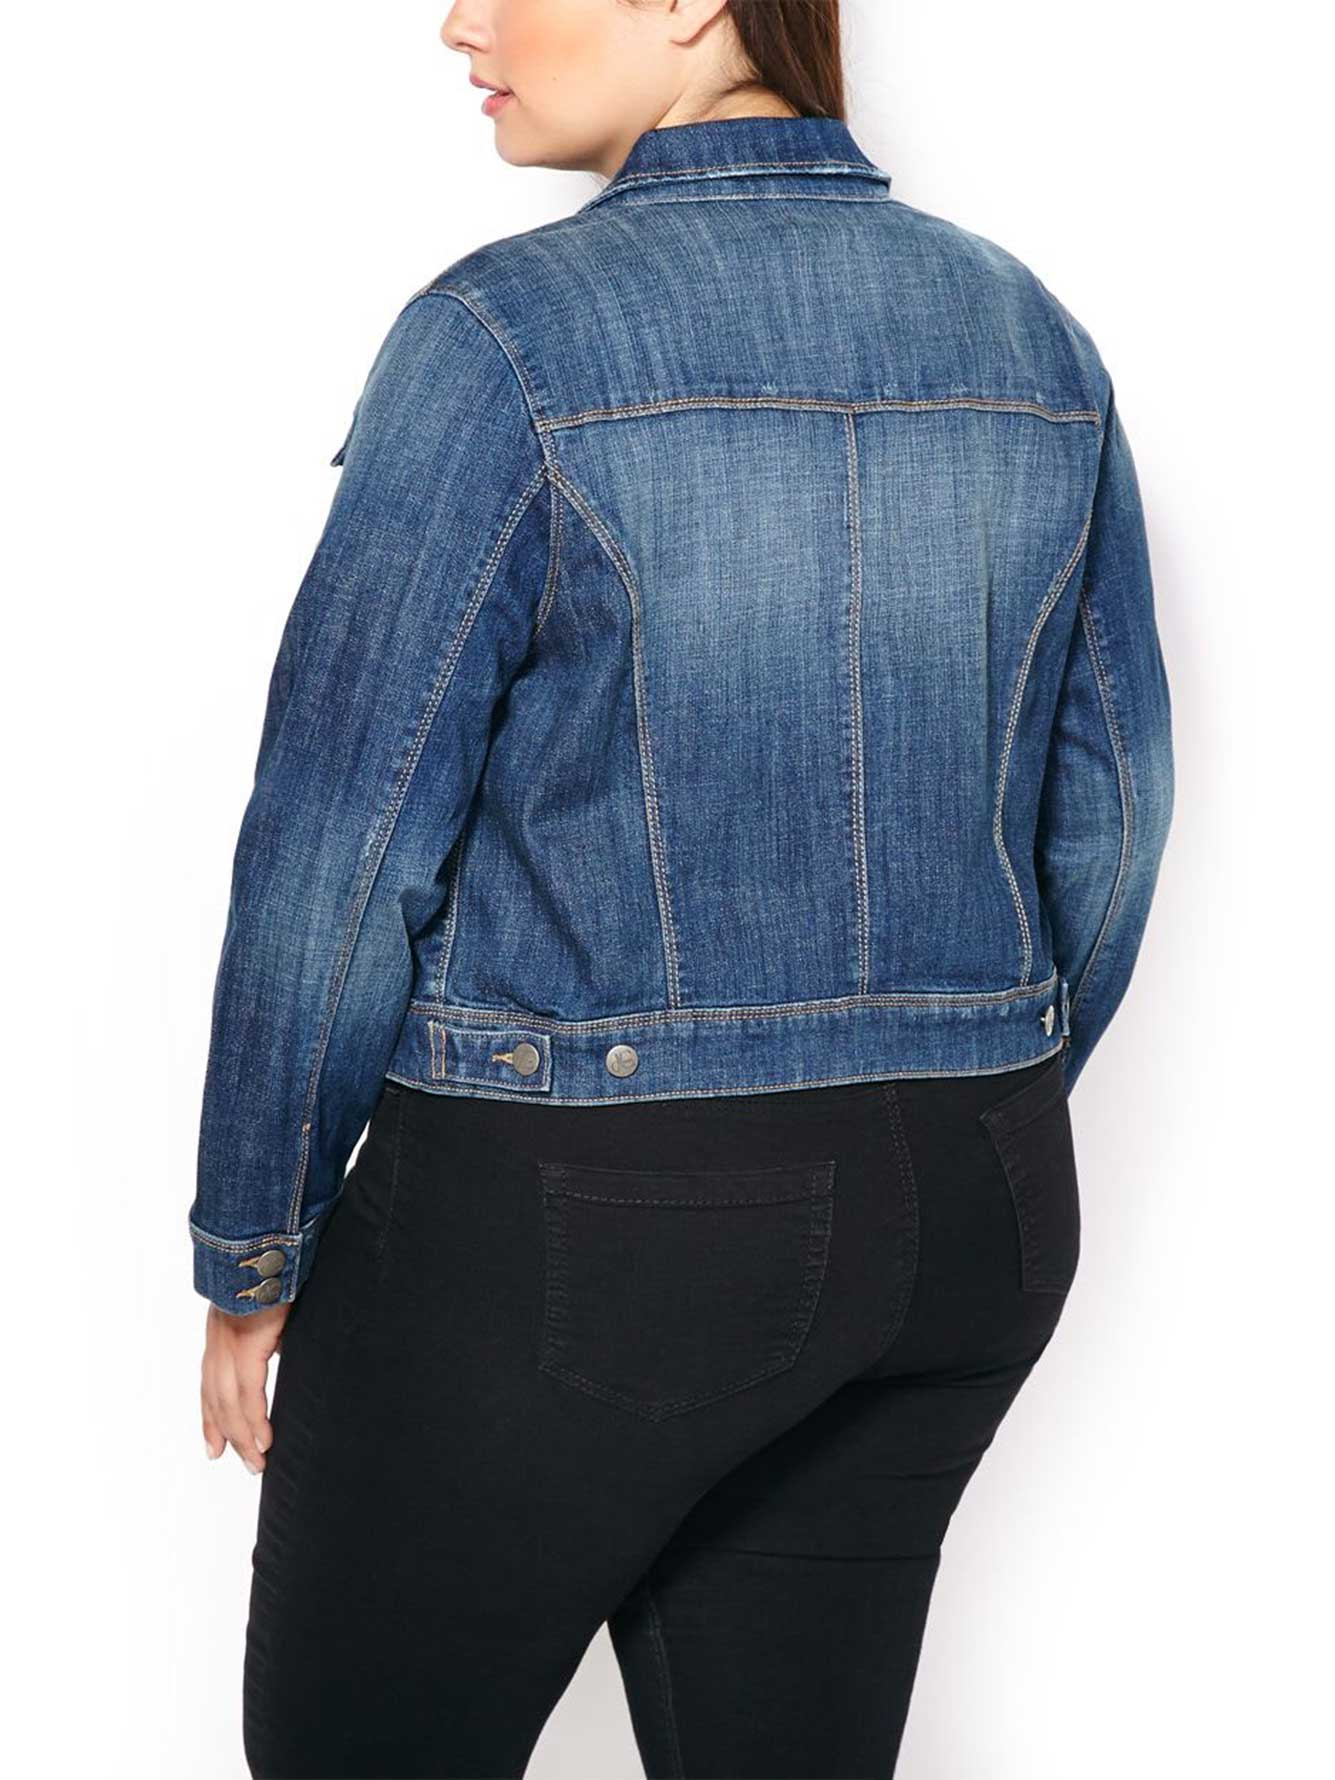 D C Jeans Long Sleeve Denim Jacket Penningtons